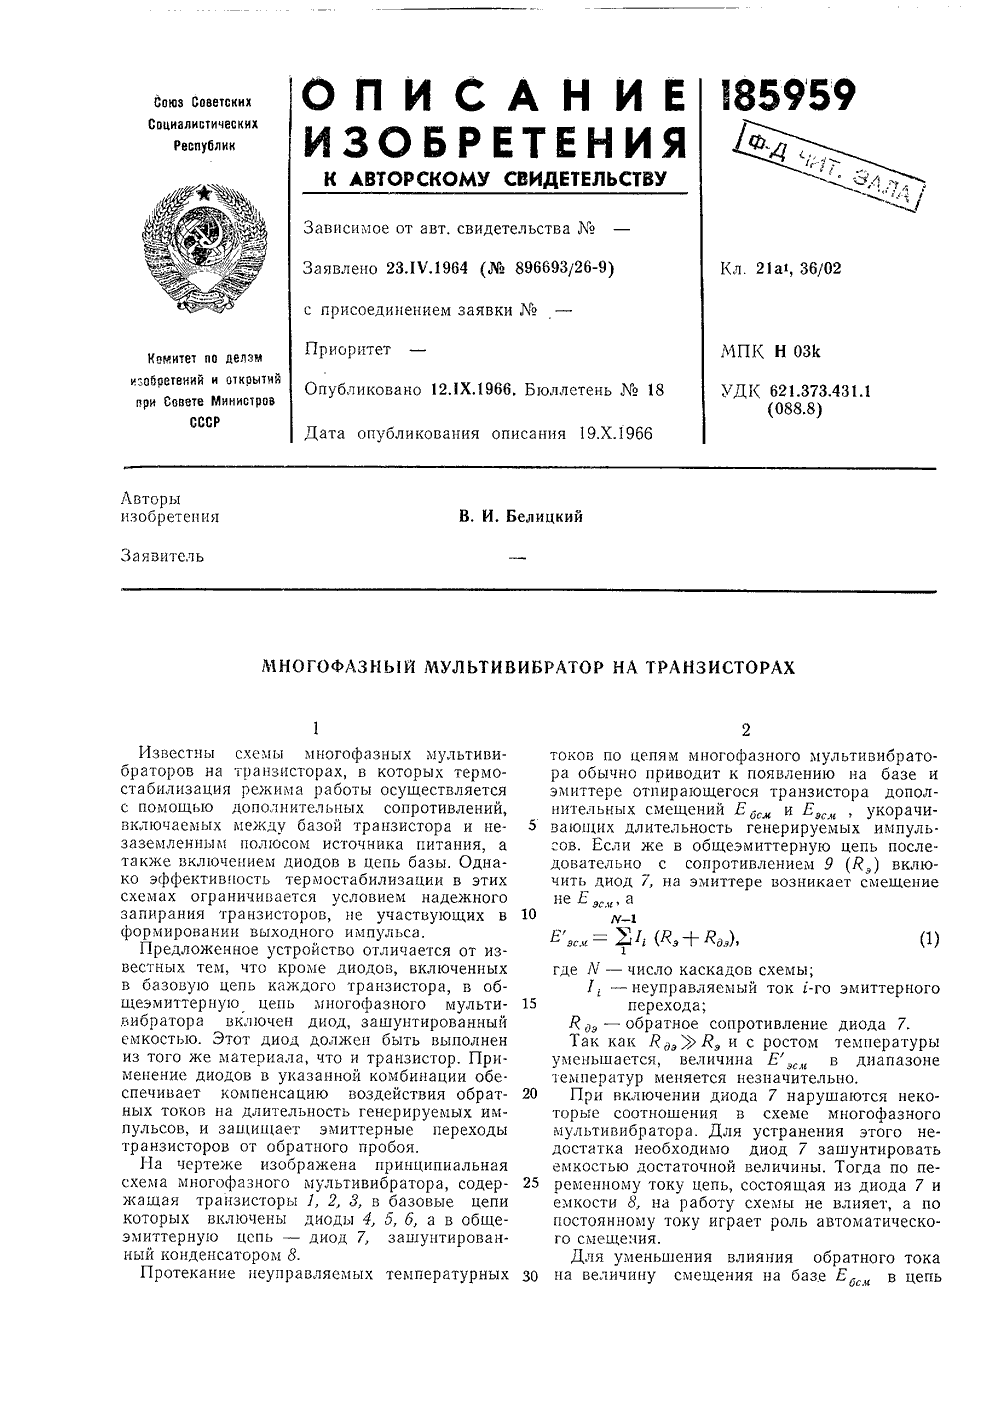 мультивибратор схема номиналы